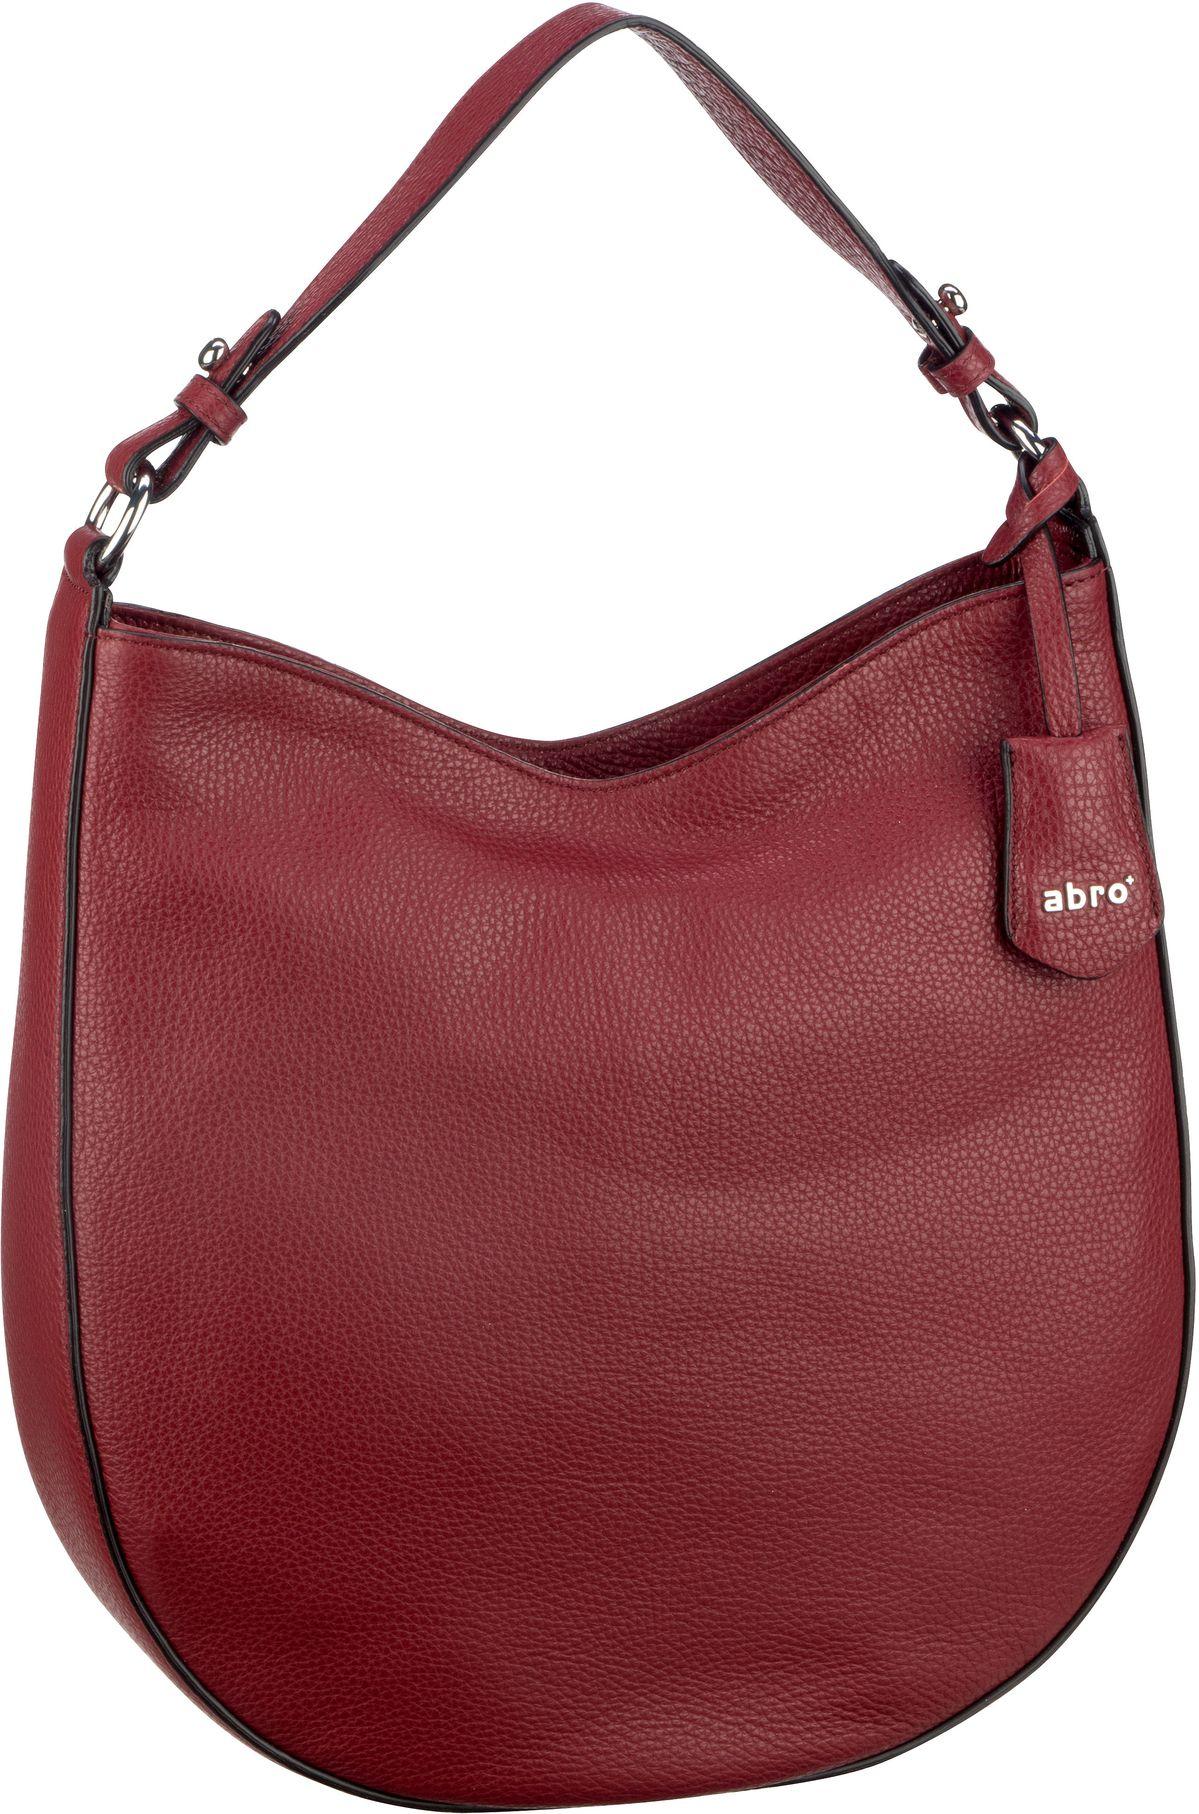 Handtasche Calf Adria 28486 Ruby